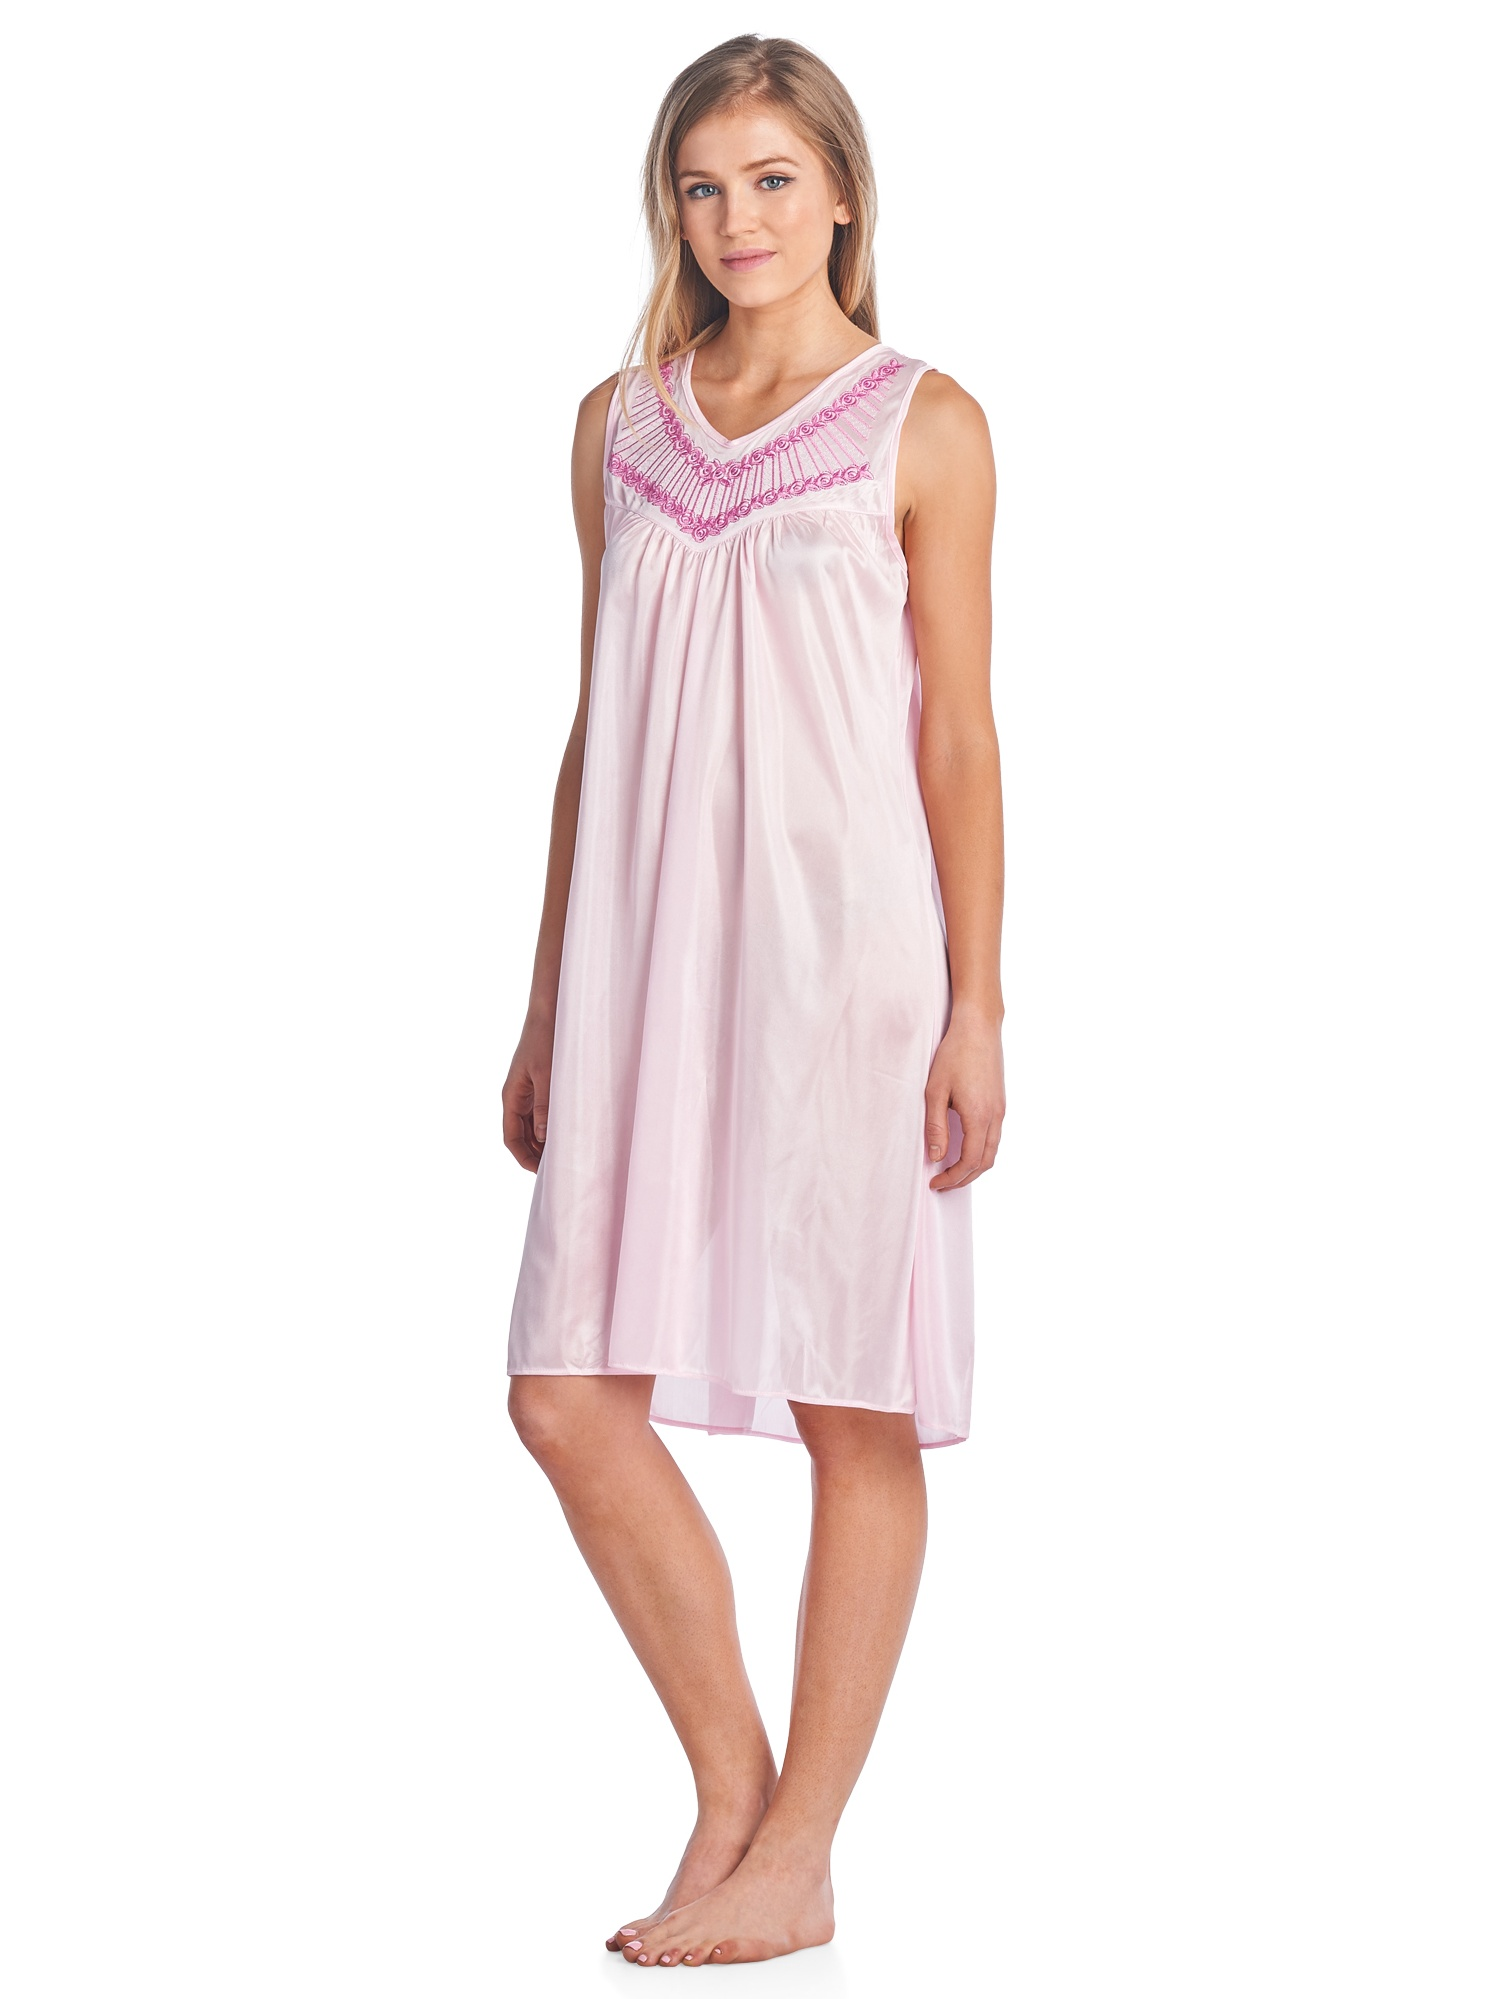 Walmart Womens Nightgowns 6e03a5615